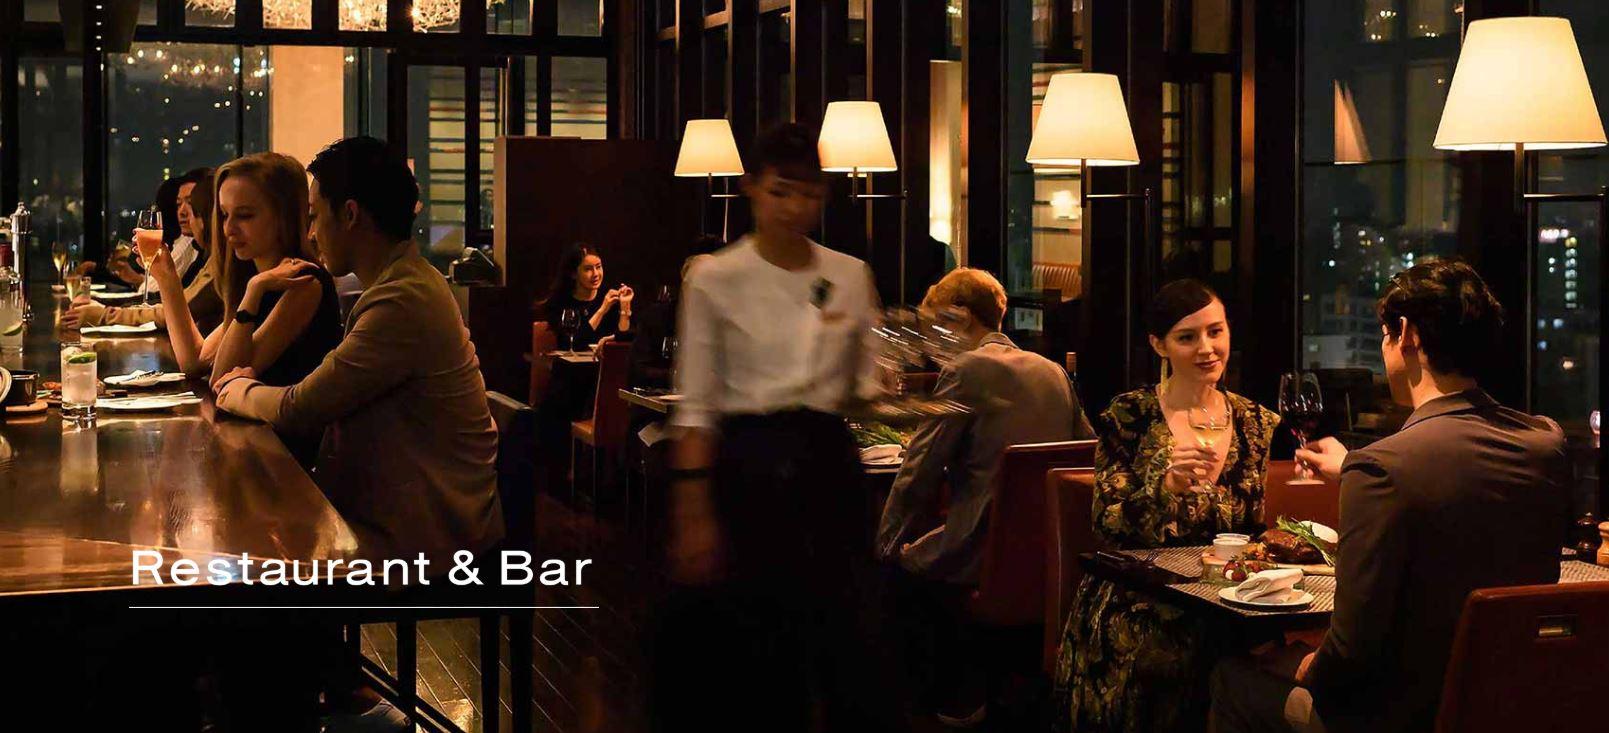 R restaurant & bar view